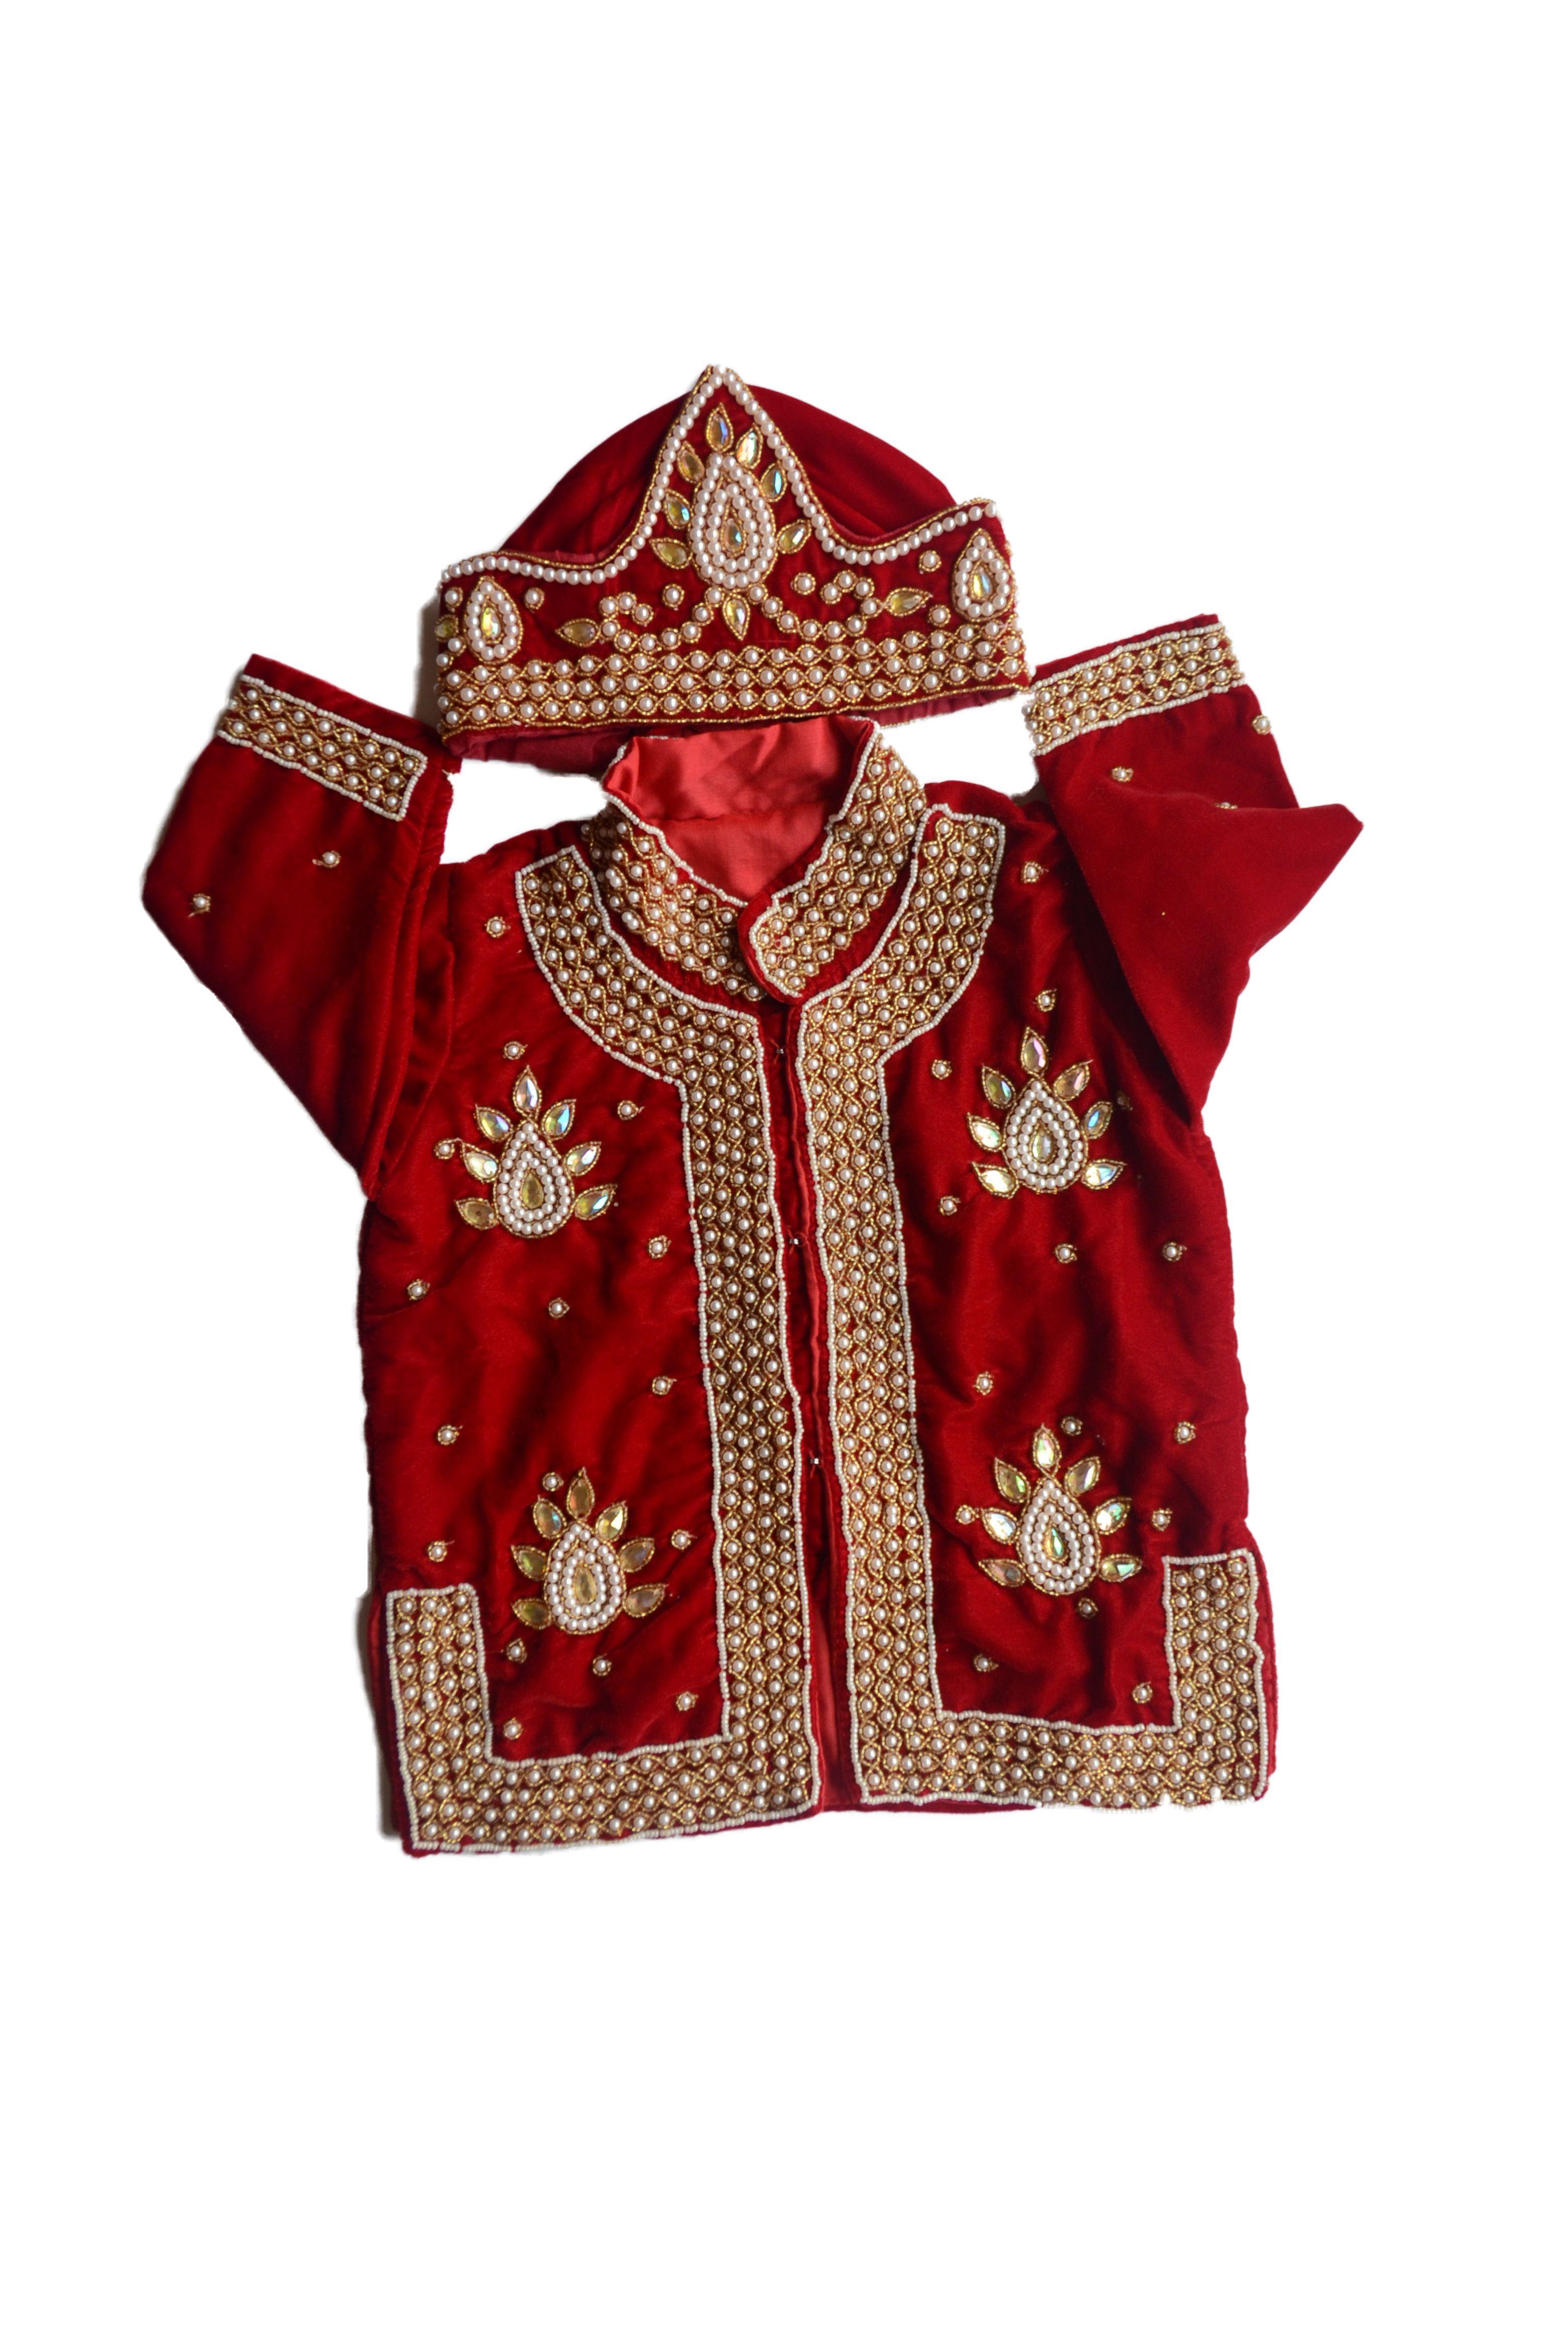 ef02f20b0 Nepali Annaprasan Ceremony Dress | Nepali handicrafts in United ...